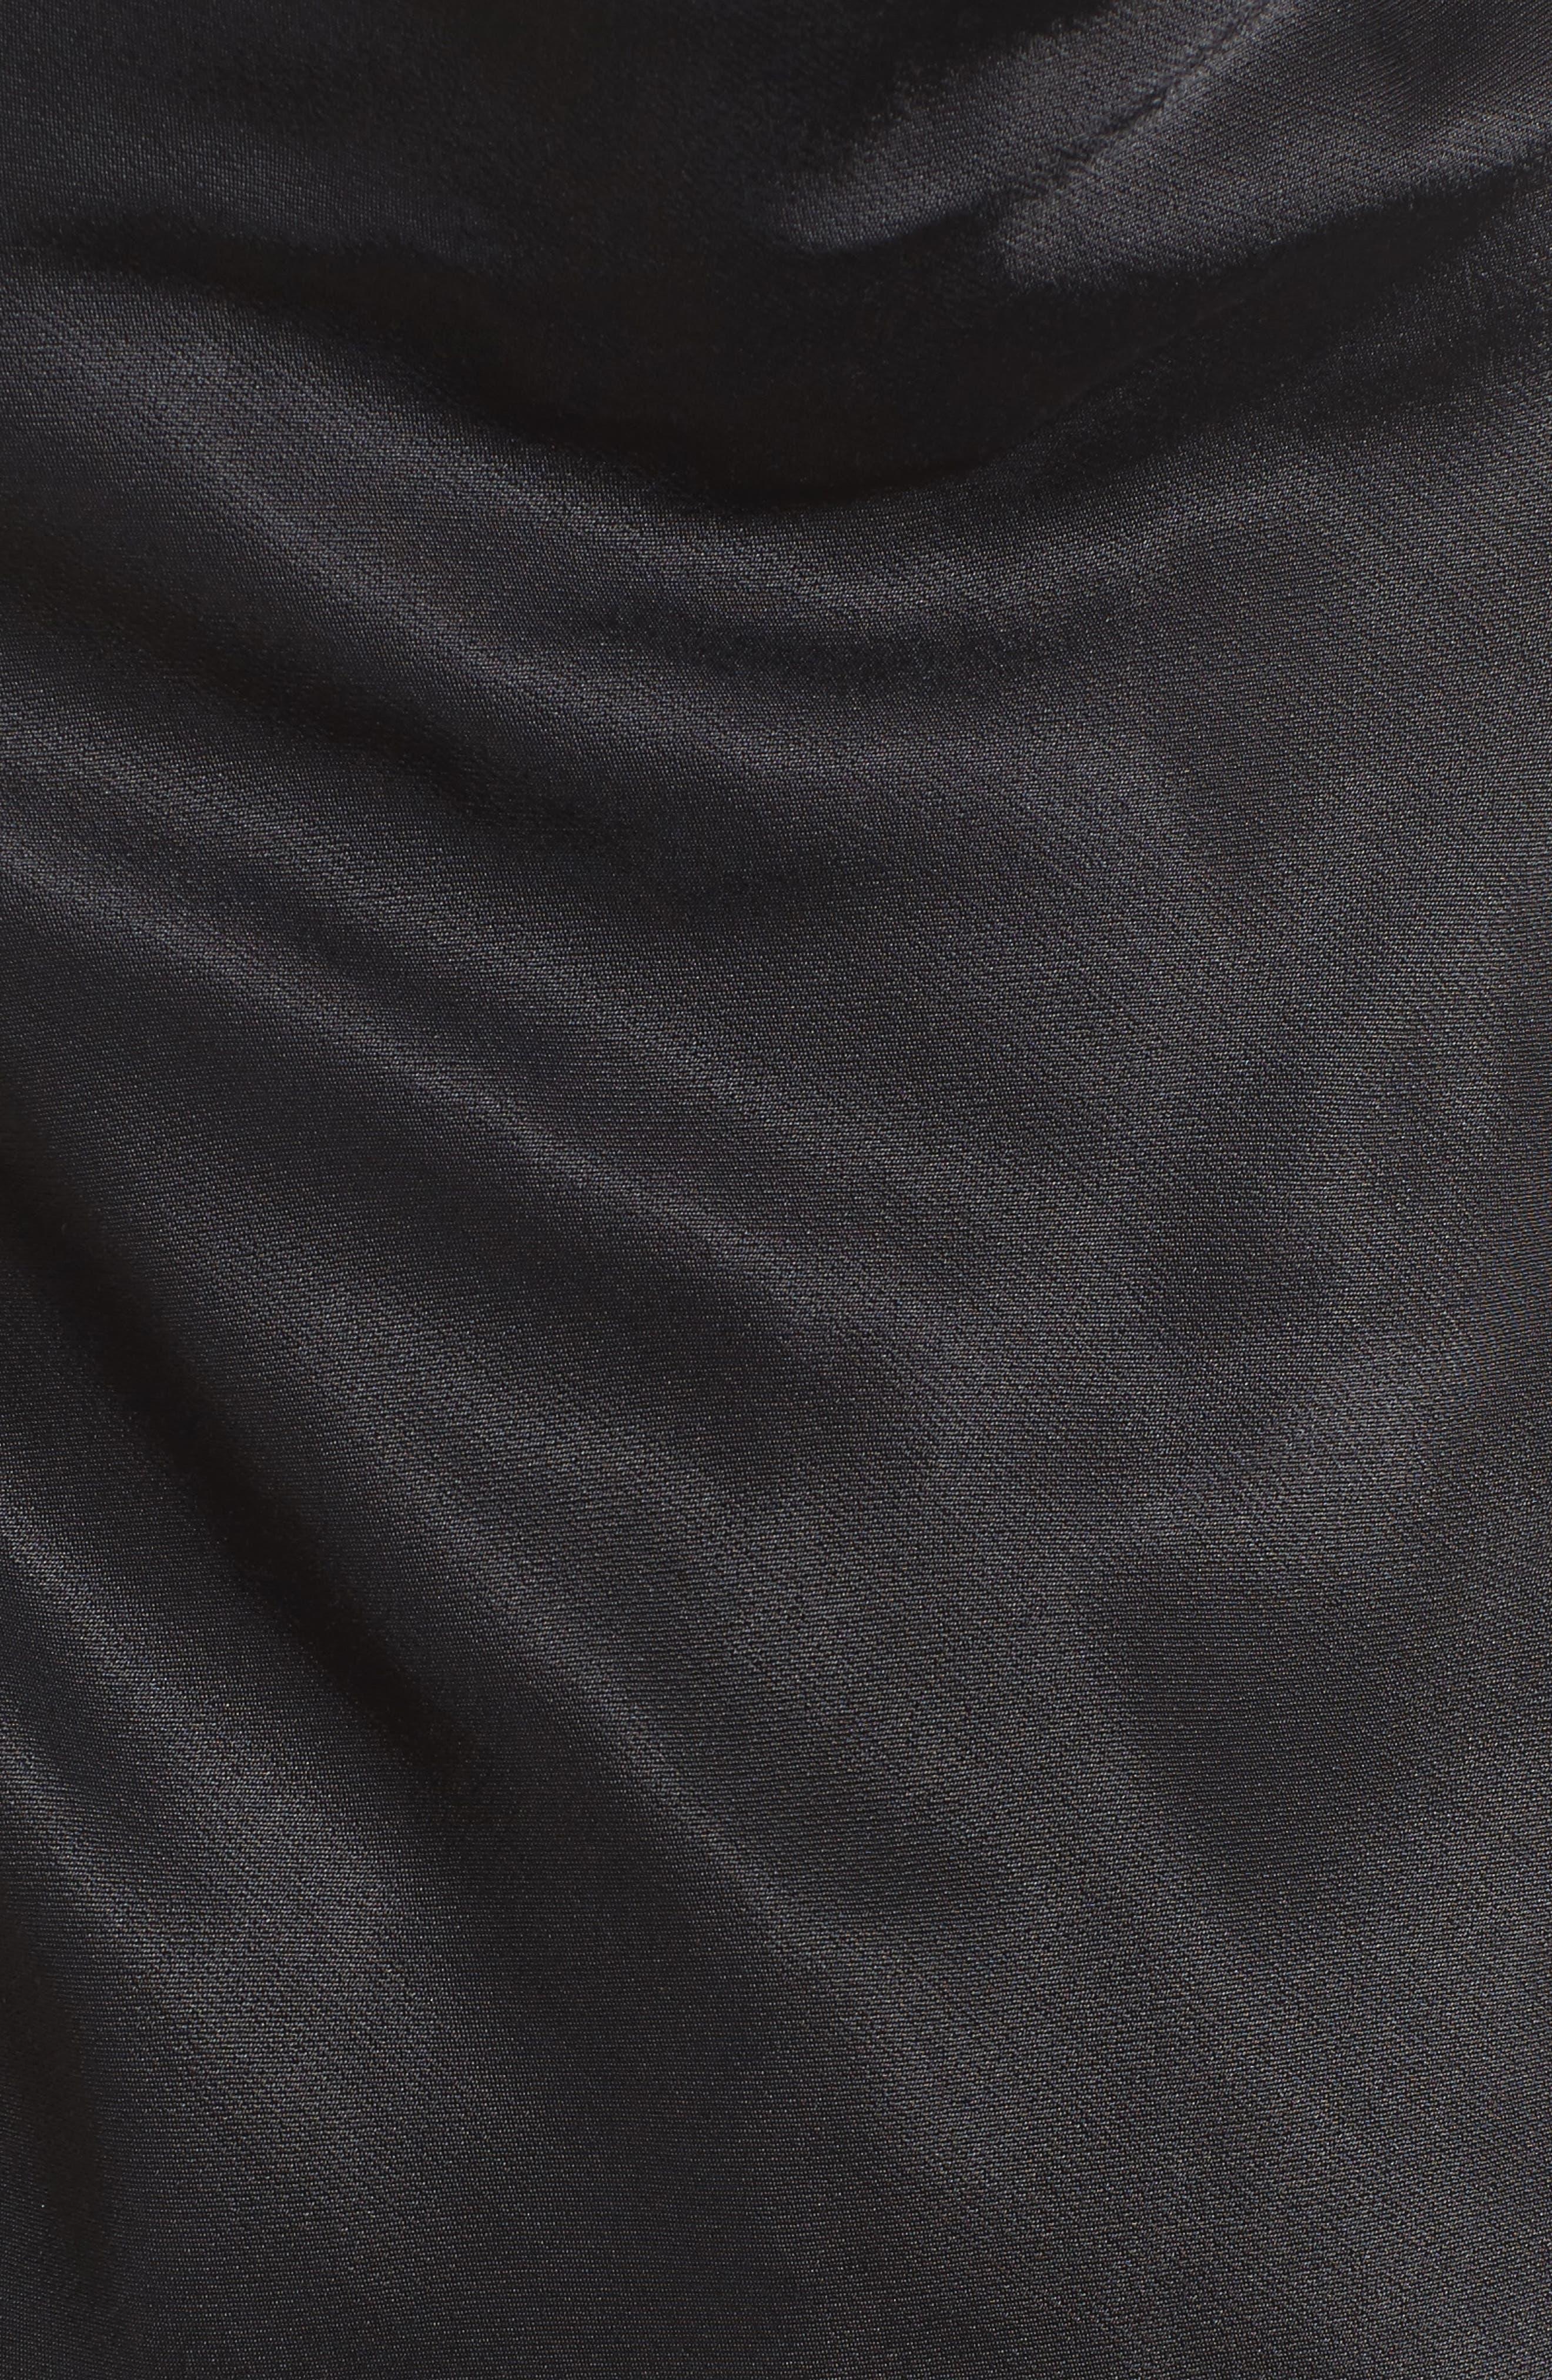 Iggy Chain Cowl Neck Tank,                             Alternate thumbnail 5, color,                             Black